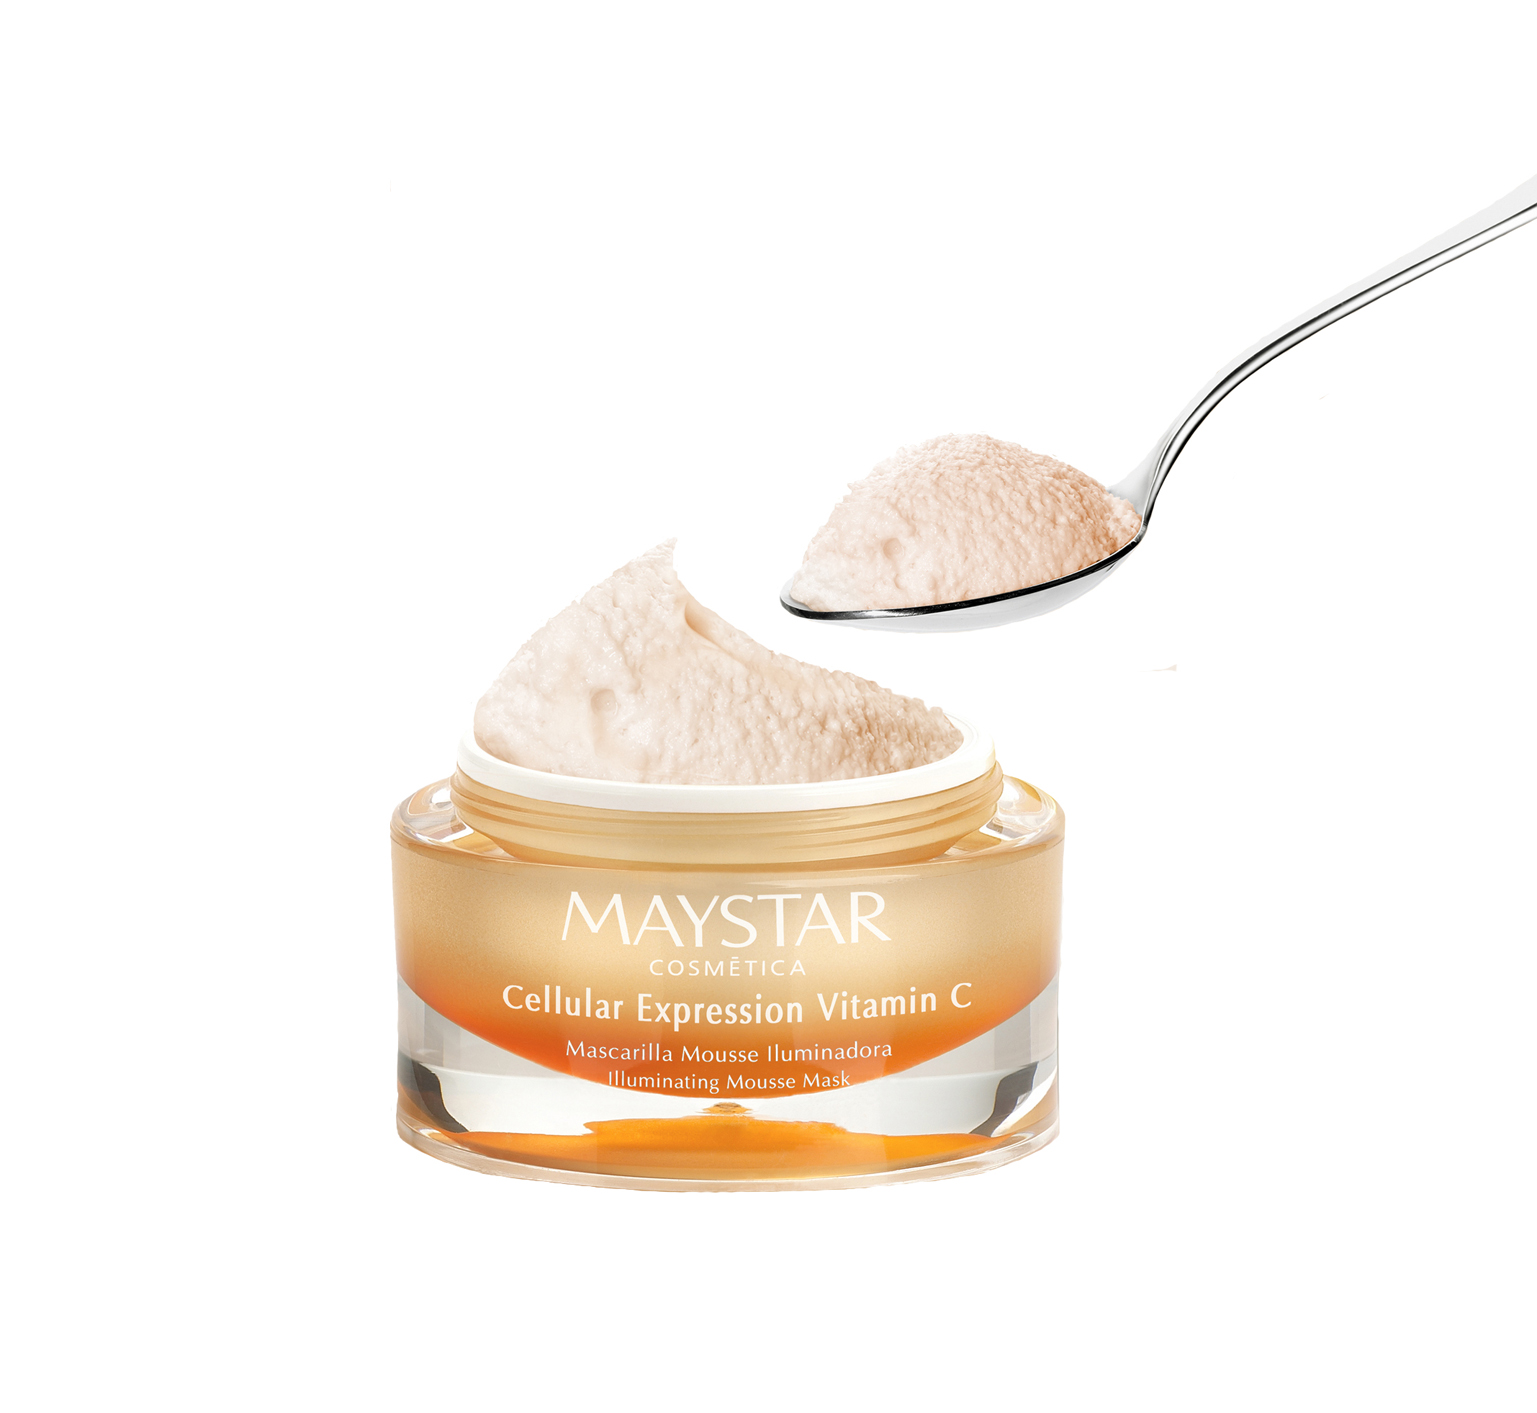 Mascarilla Mousse fondo blanco(1)